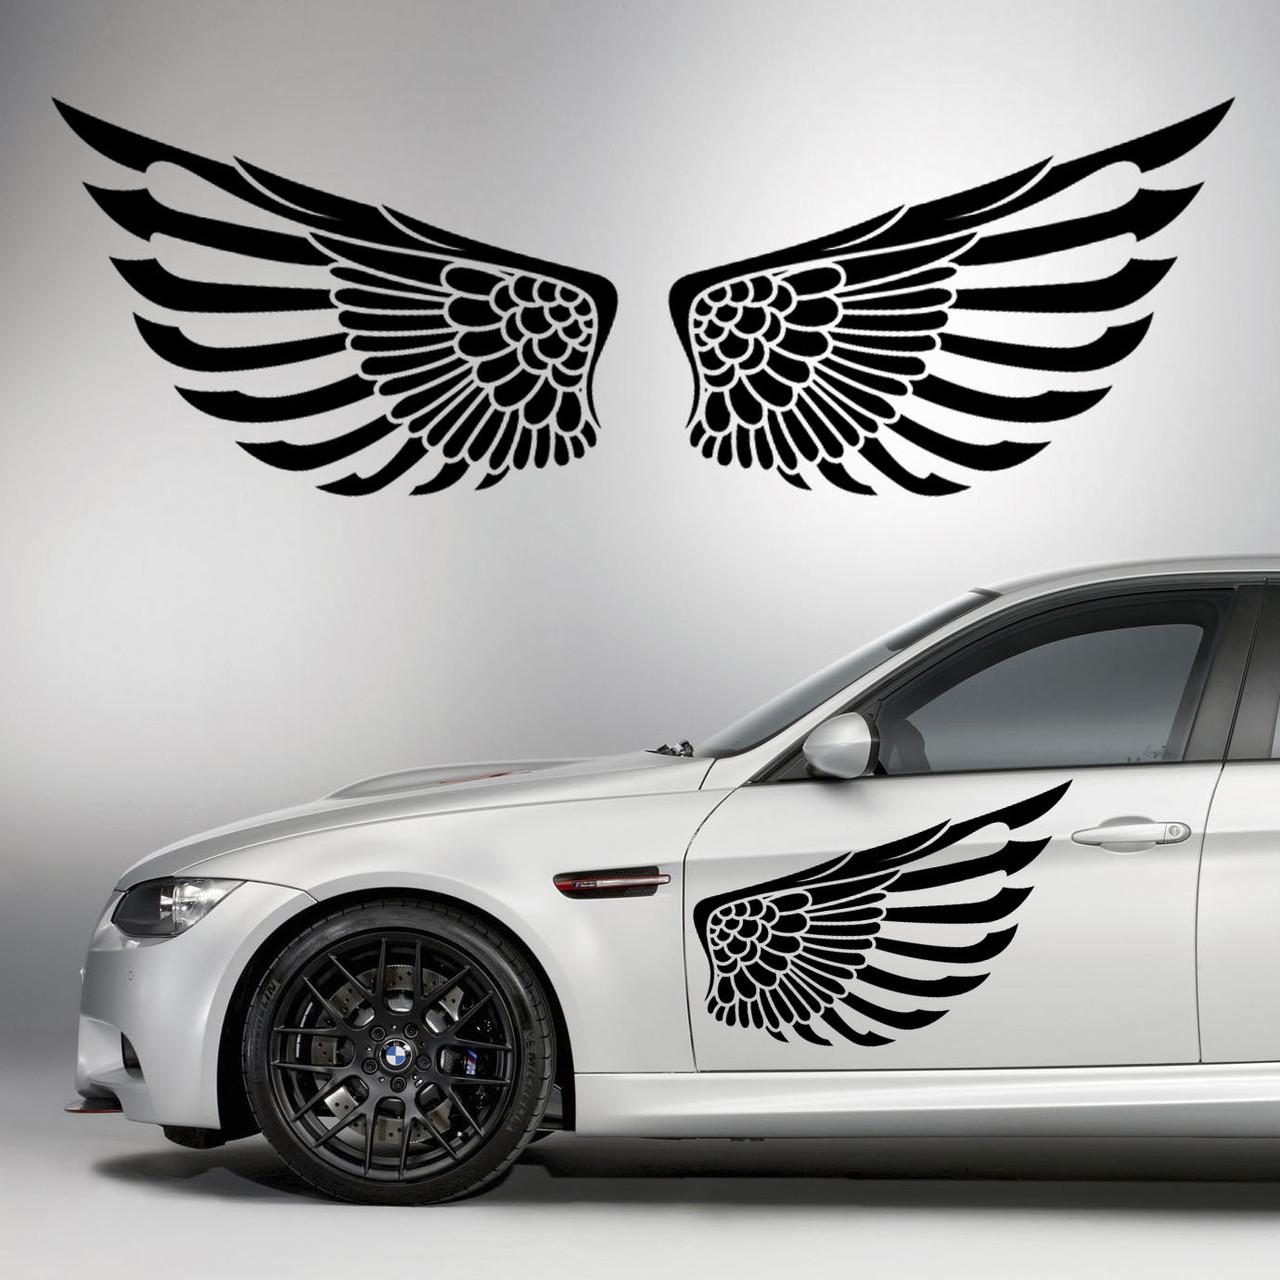 Наклейки КРЫЛЬЯ. Наклейка на авто крылья ангела на двери, на кузов, на капот. Размер 80х29см. Цена за 2шт.!